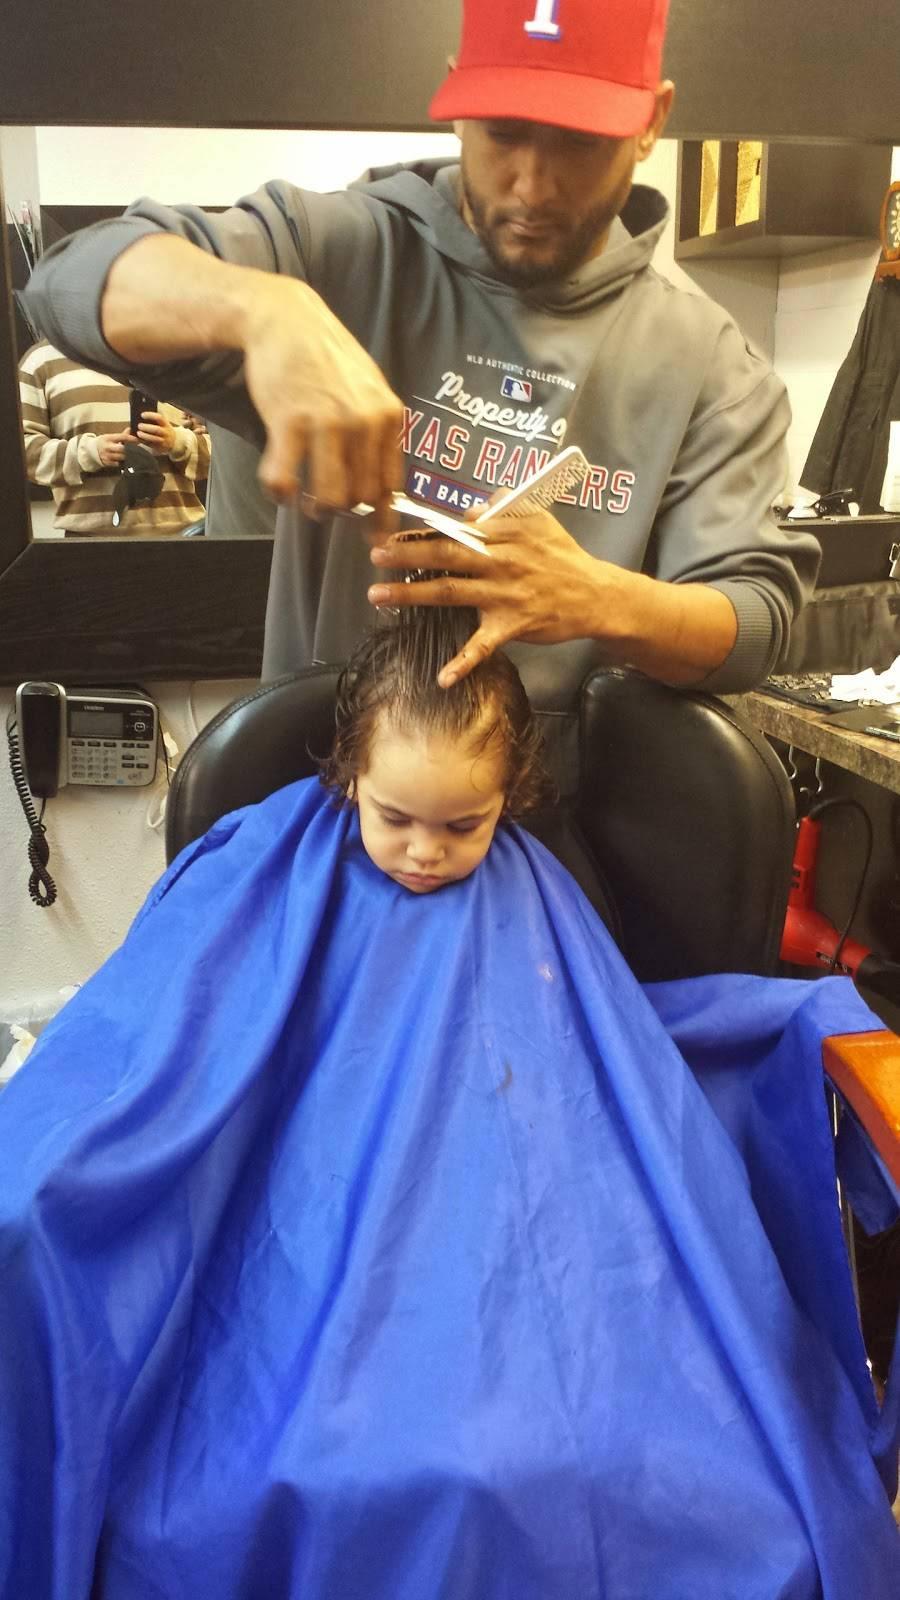 Xclusivo Cutz - hair care  | Photo 2 of 6 | Address: 2020 Mansfield Webb Rd, Arlington, TX 76002, USA | Phone: (817) 557-6448